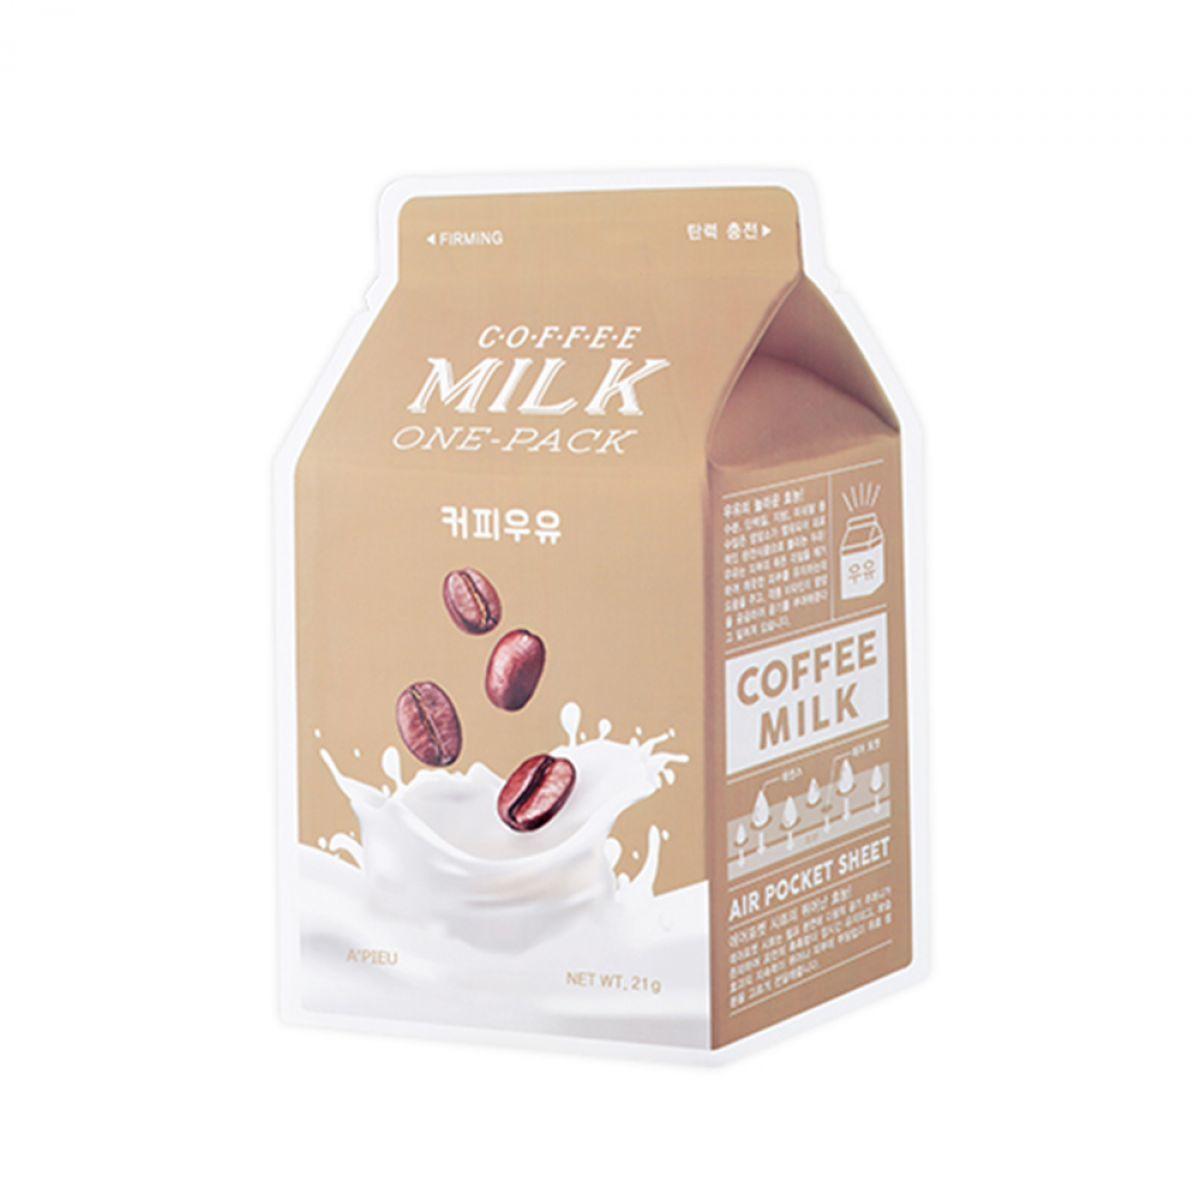 Тканевые Маска тканевая для лица A'PIEU Coffee Milk One-Pack 21гр 8806185780285-1200x1200.jpg